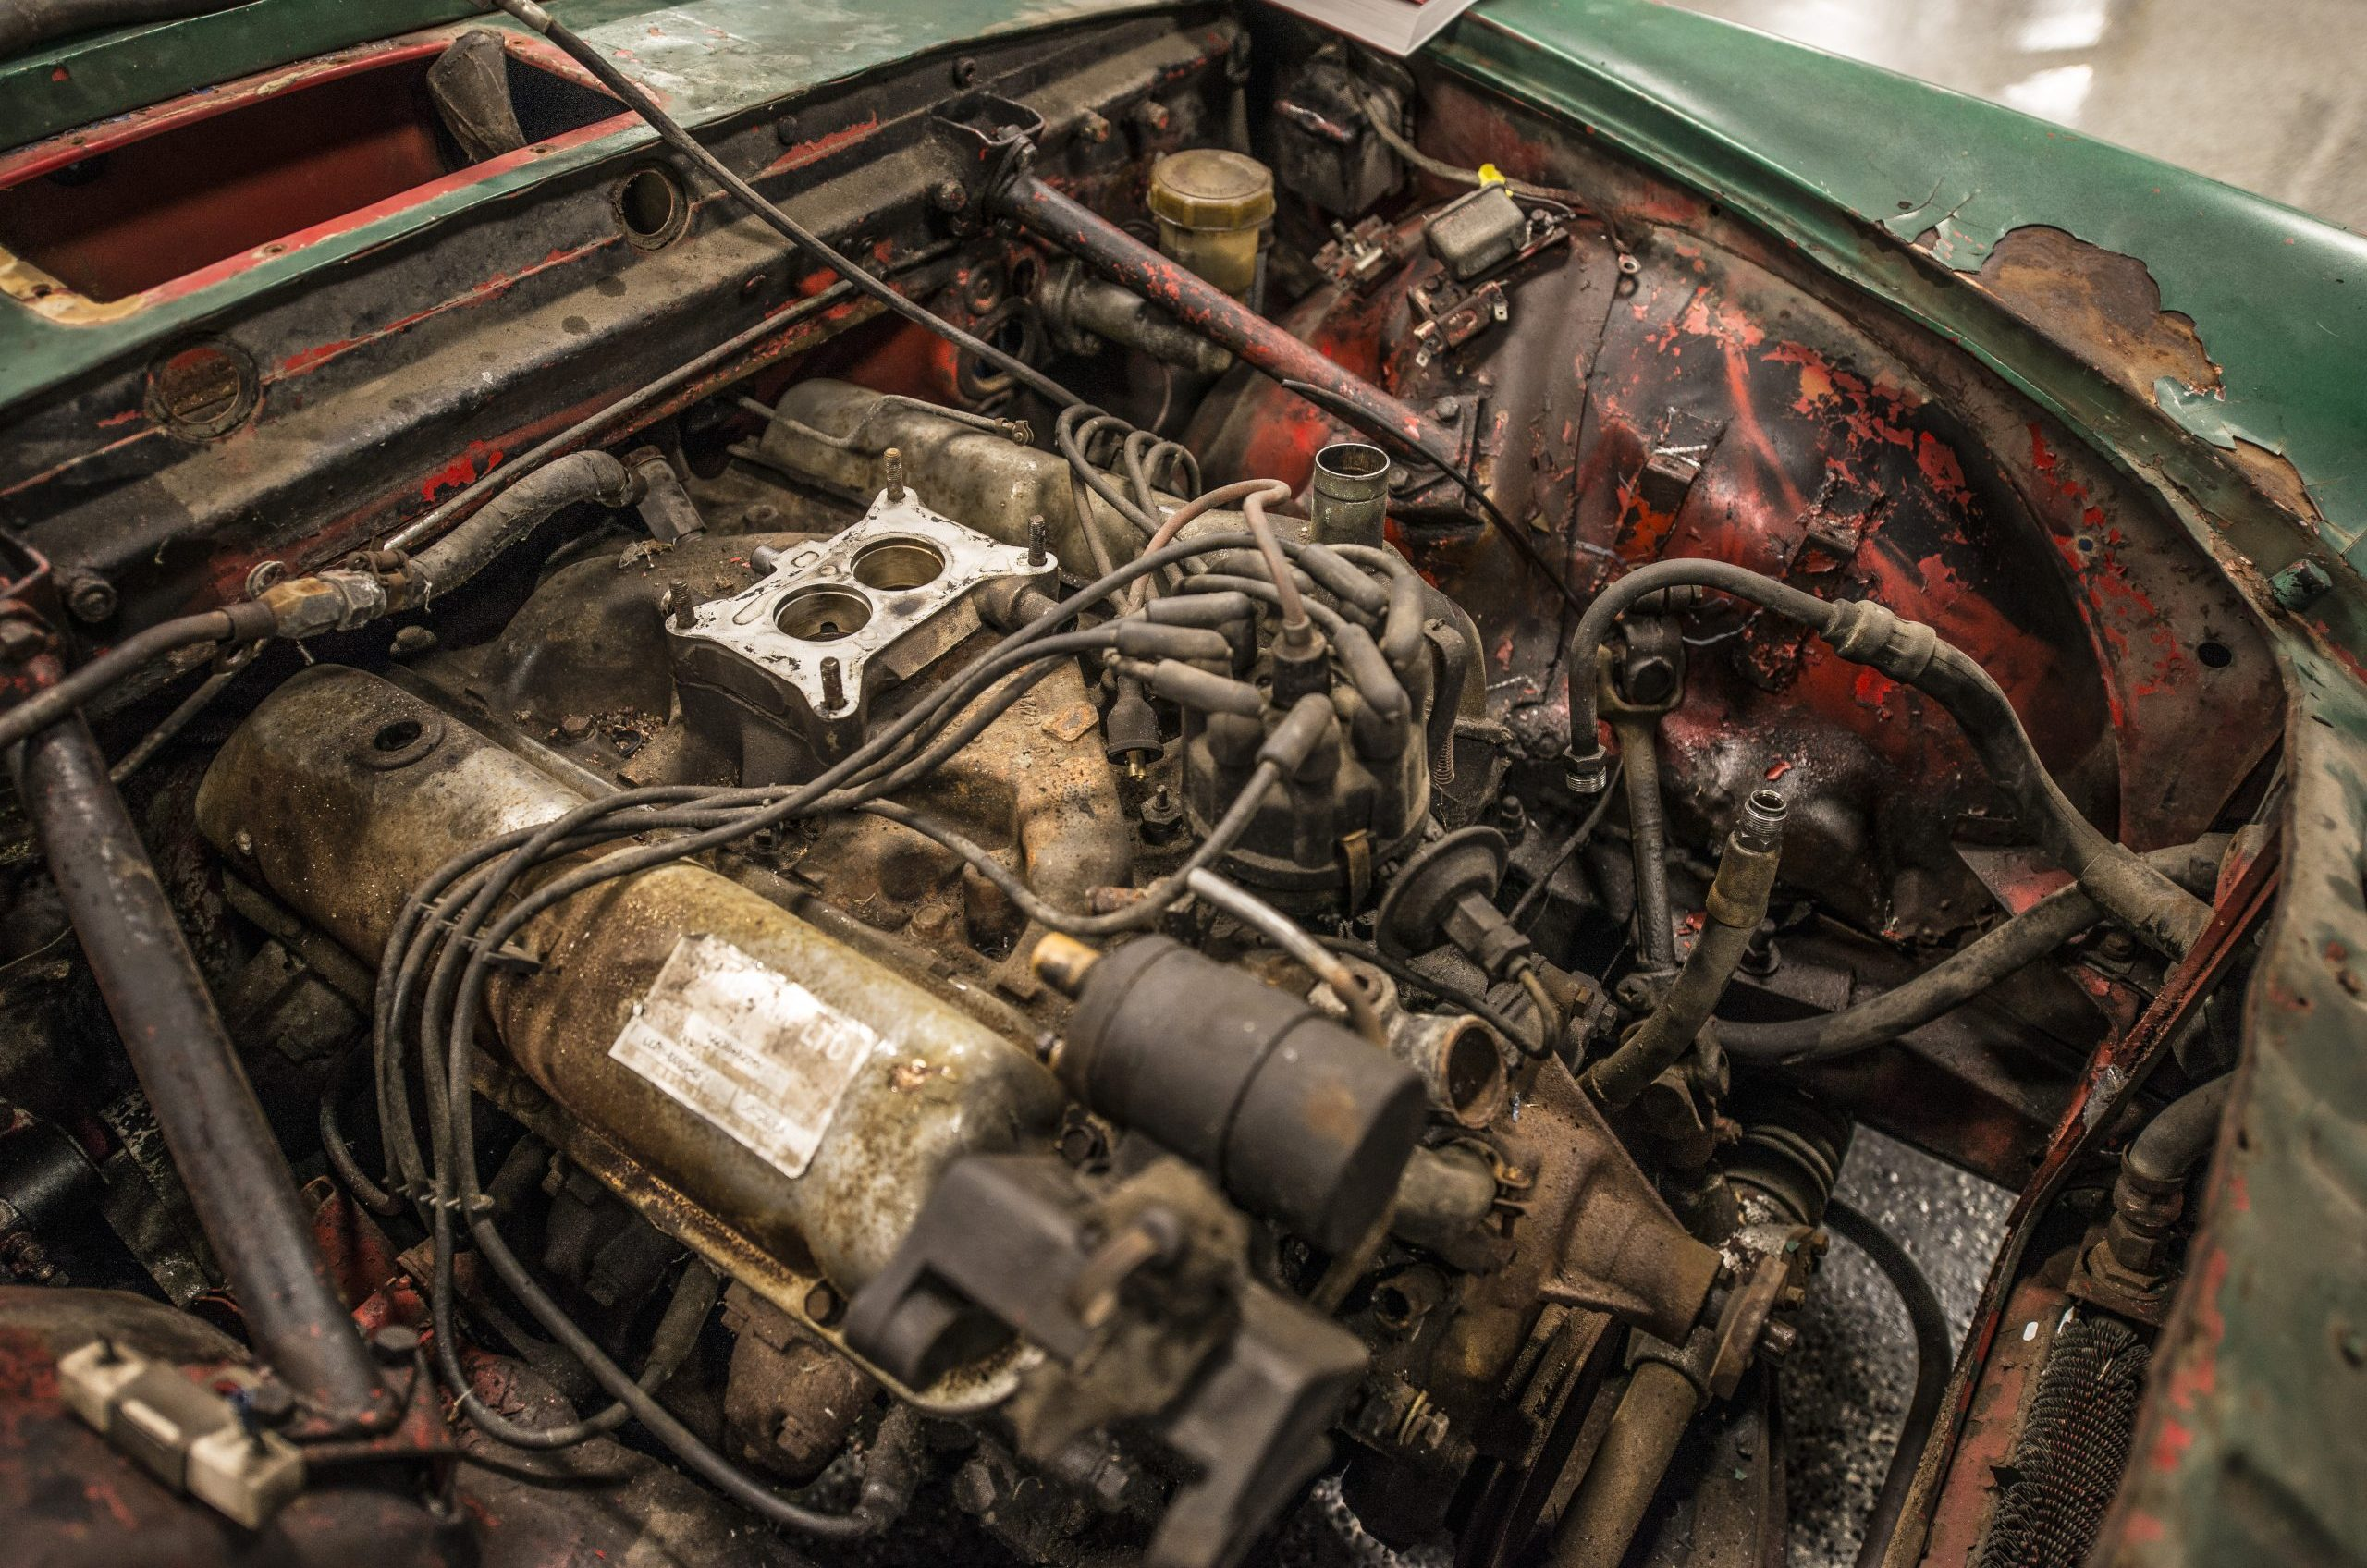 Sunbeam Tiger Restoration Engine